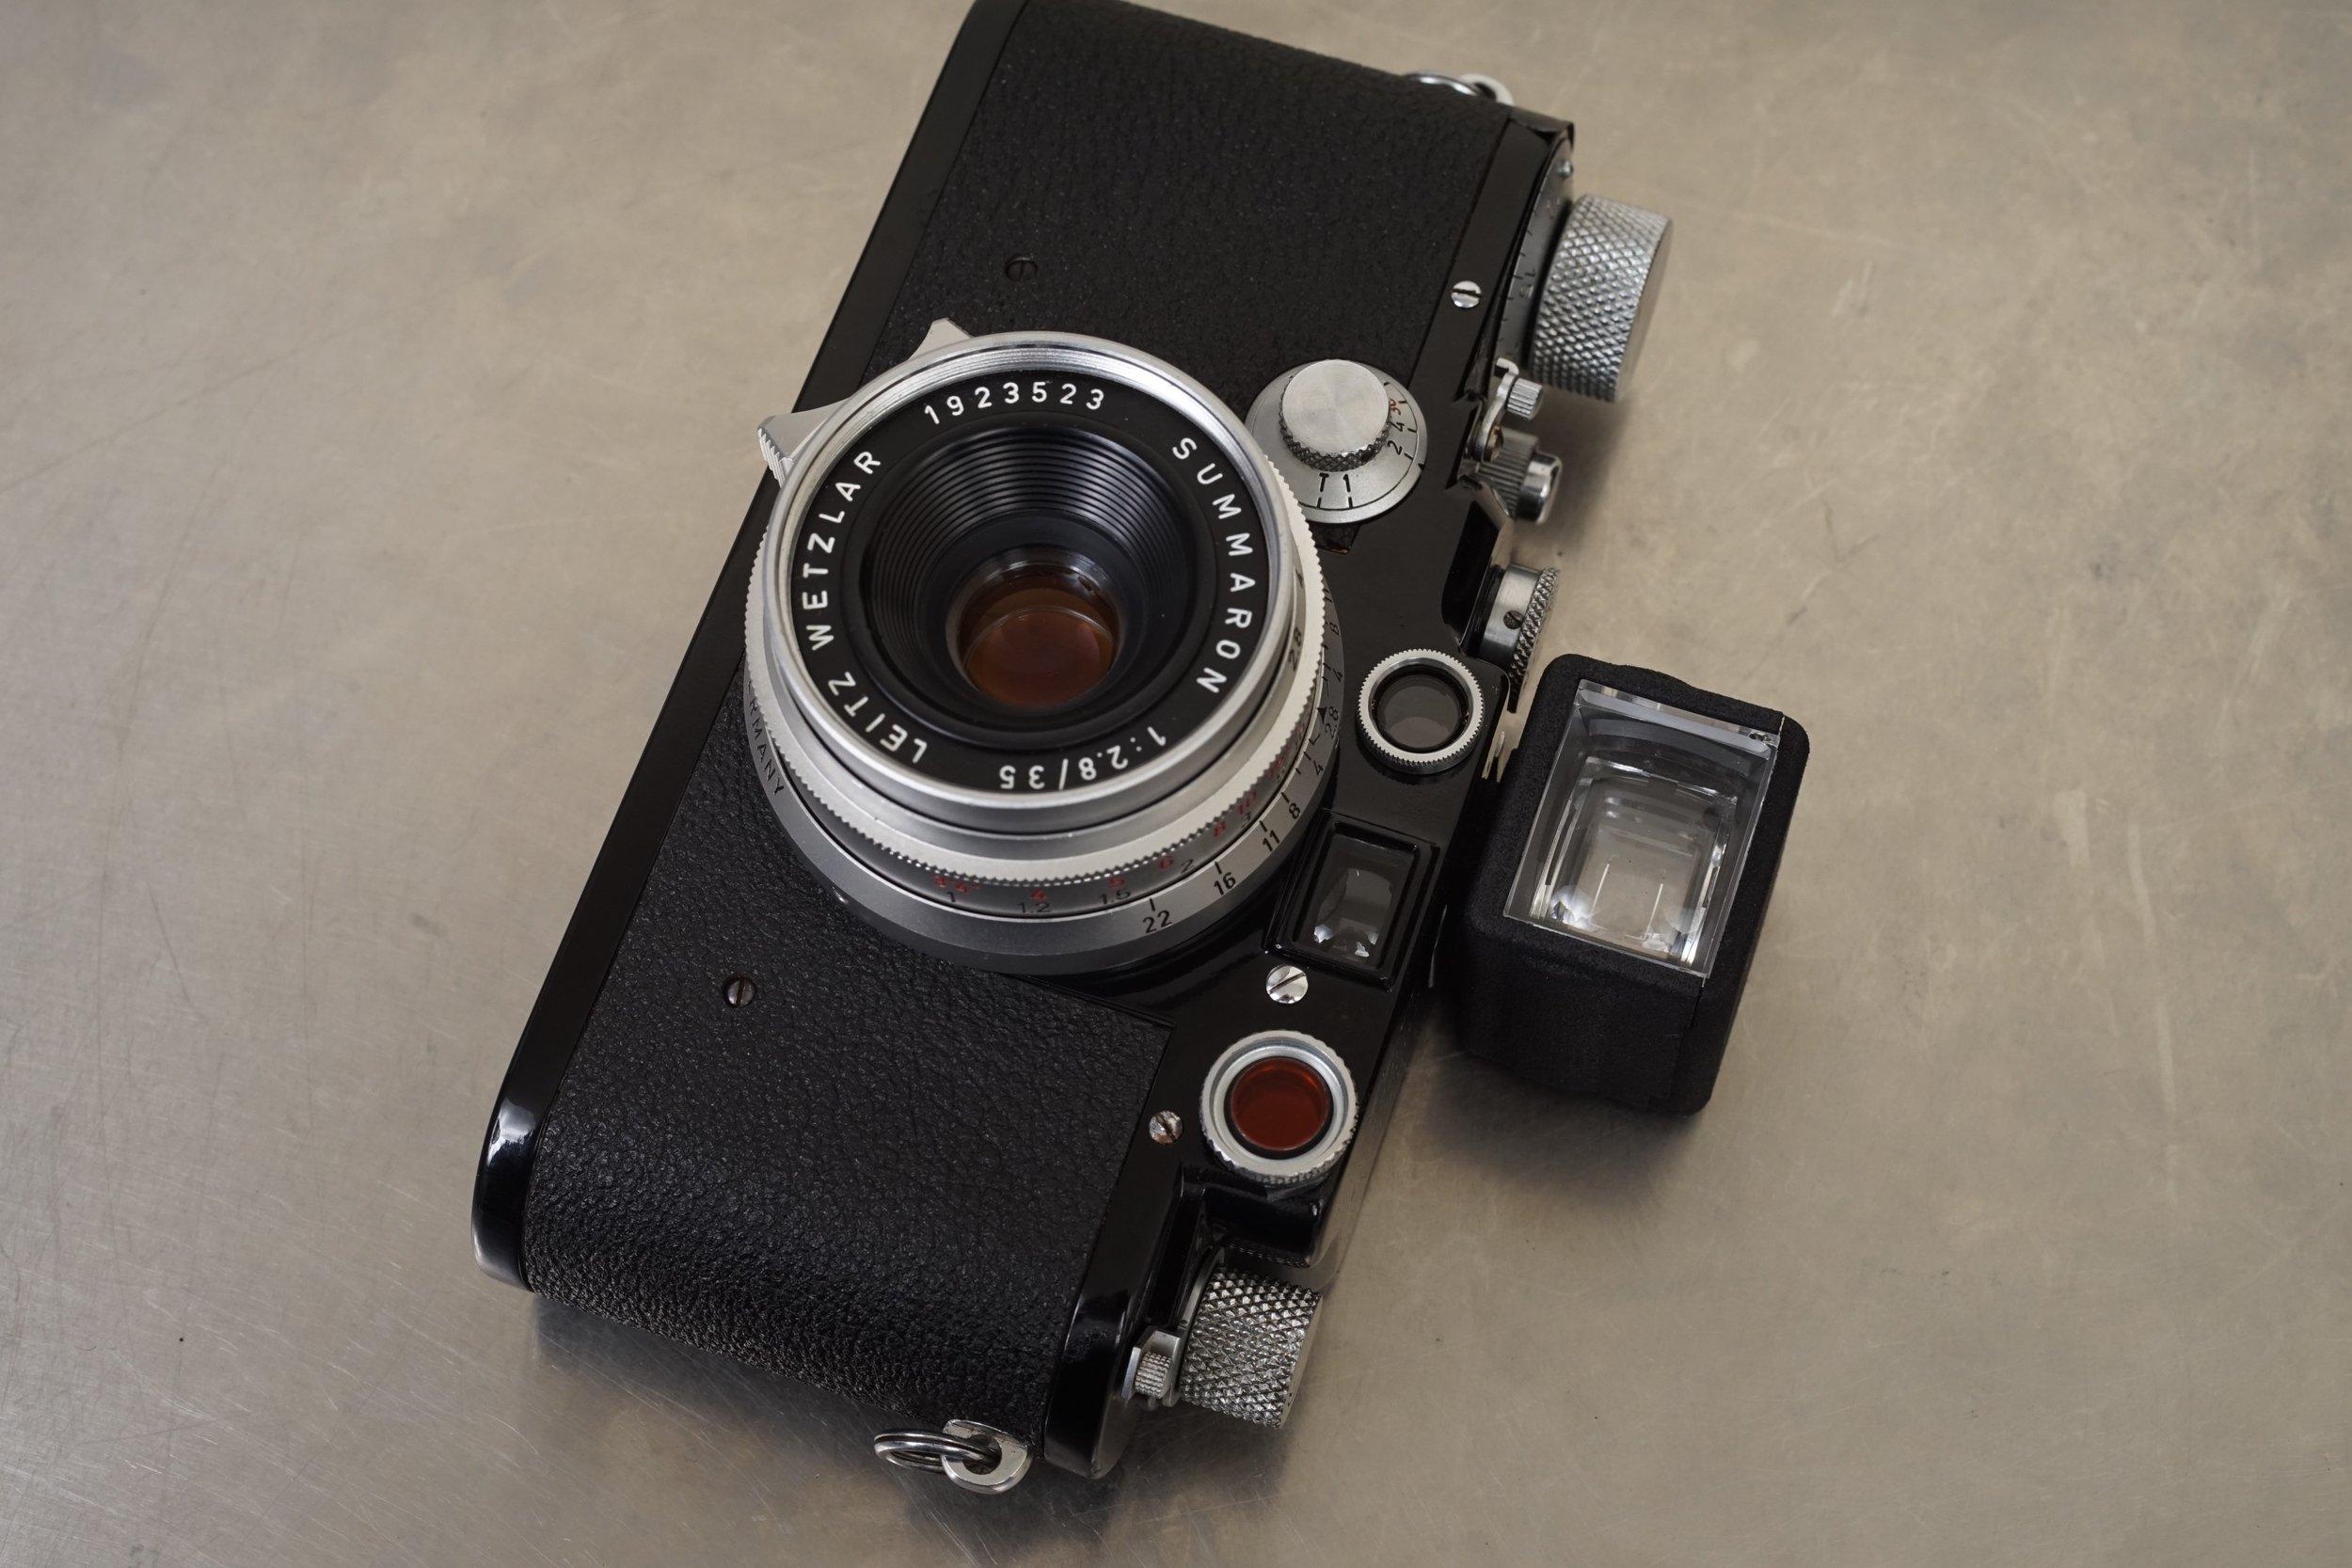 DSC00658.jpg